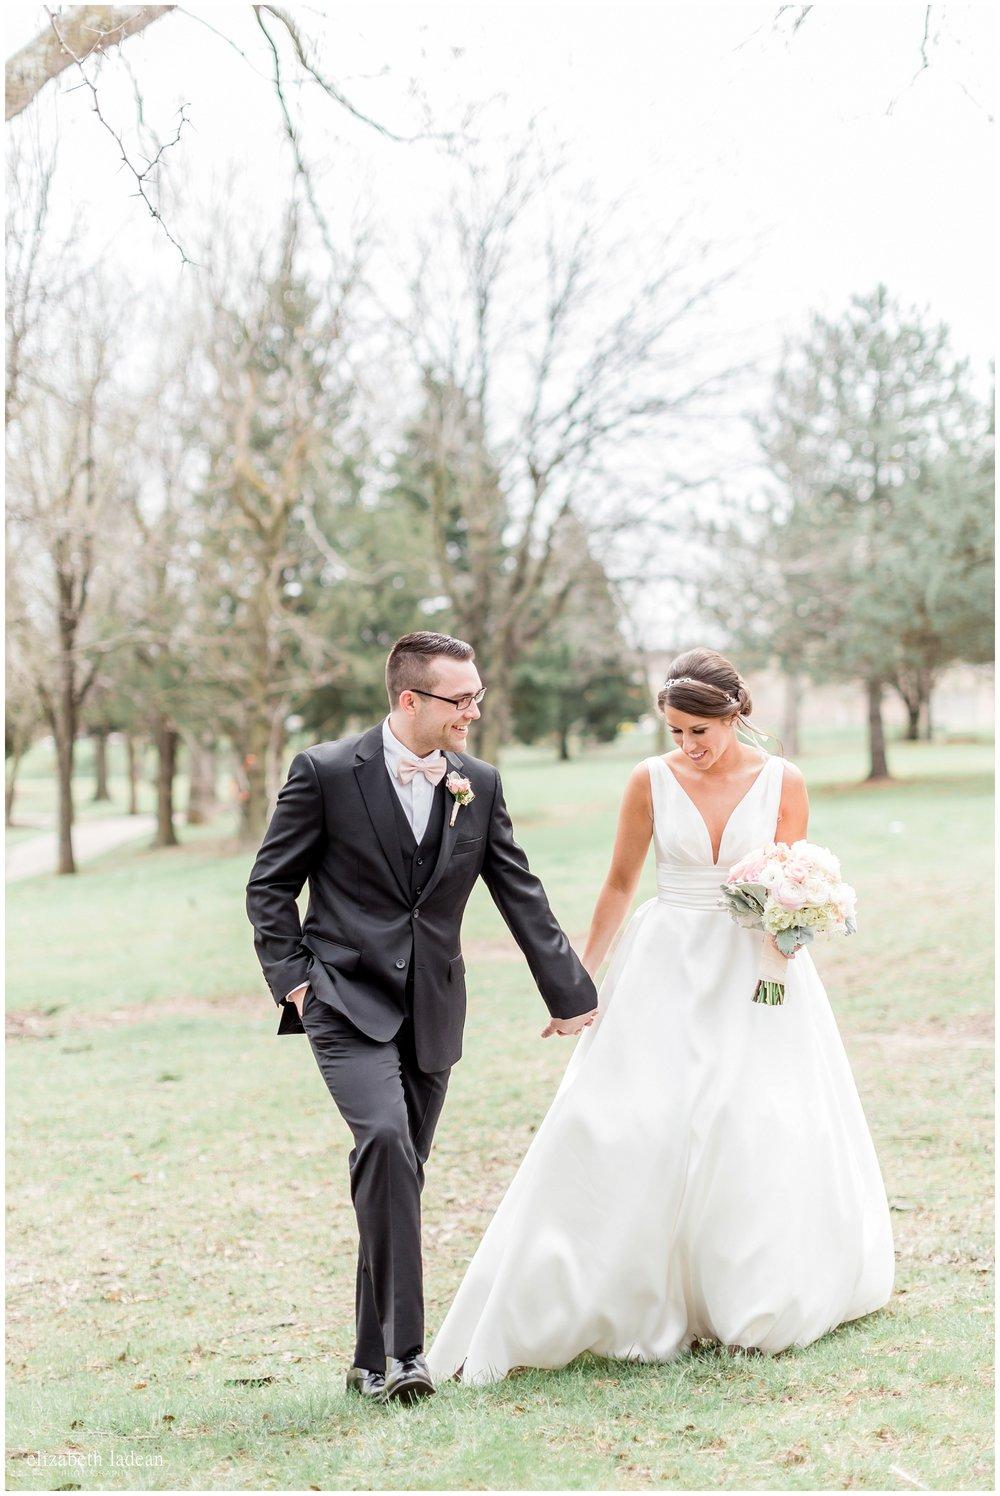 Kansas-Wedding-H+T-04.21.18-elizabeth-ladean-photography-photo-_6878.jpg